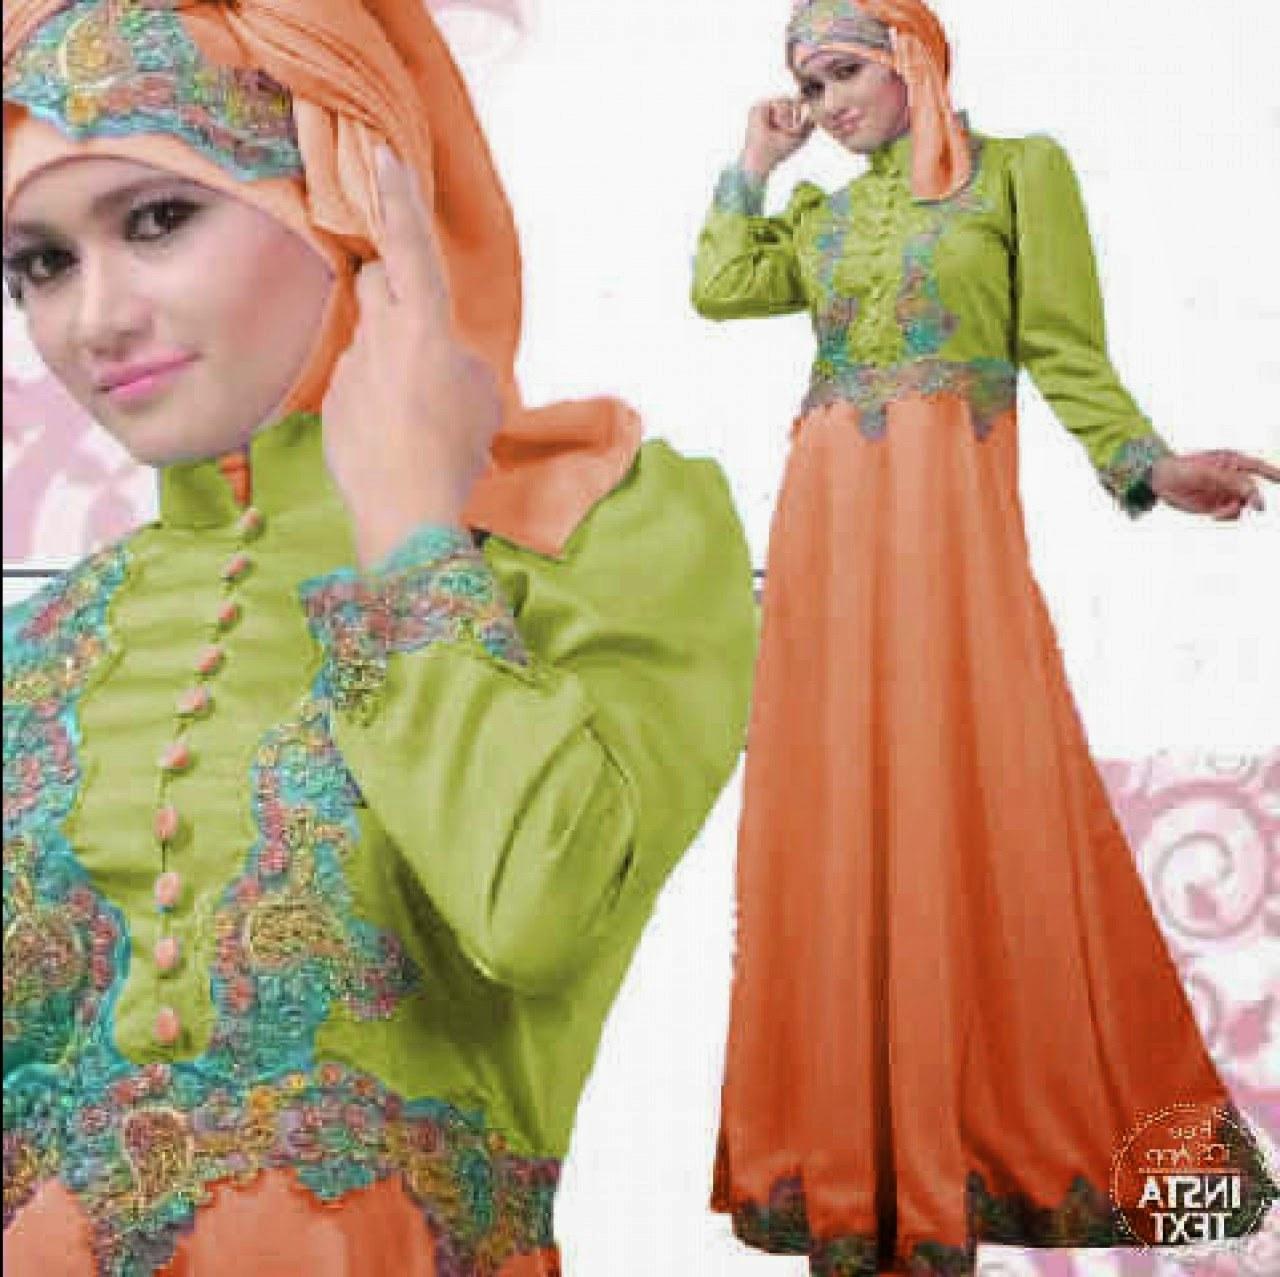 Model Model Baju Lebaran 2018 Sarimbit Fmdf Kumpulan Foto Model Baju Kebaya Lebaran Terbaru 2018